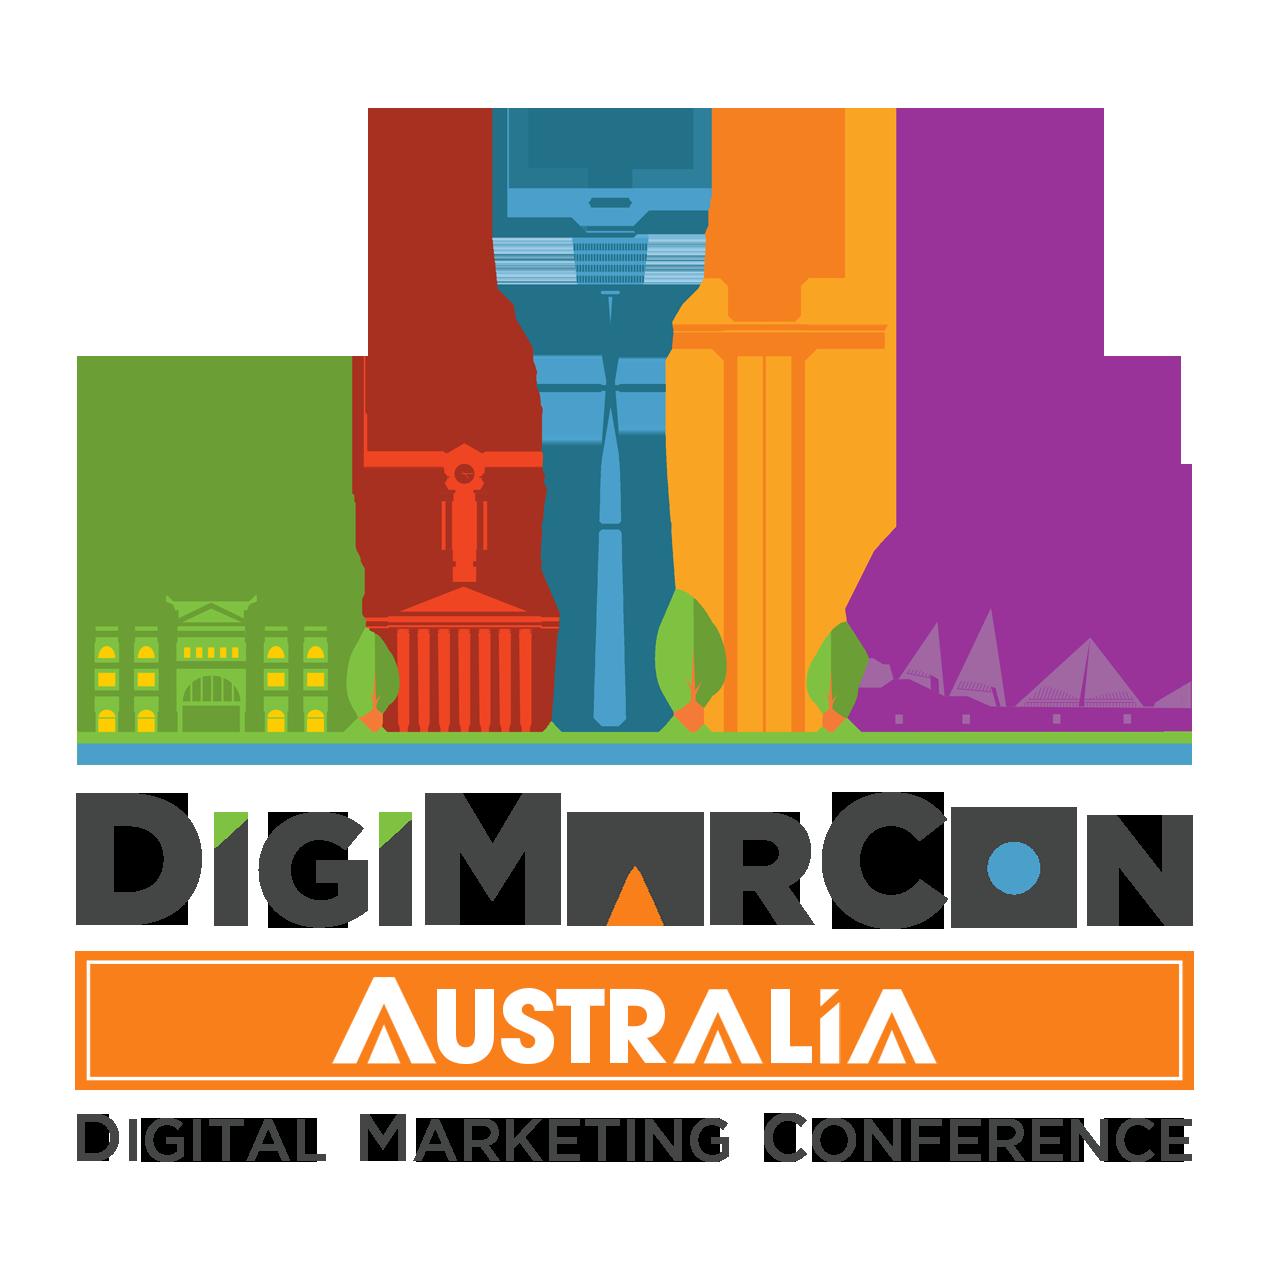 DigiMarCon Australia 2021 – Digital Marketing, Media and Advertising Conference & Exhibition